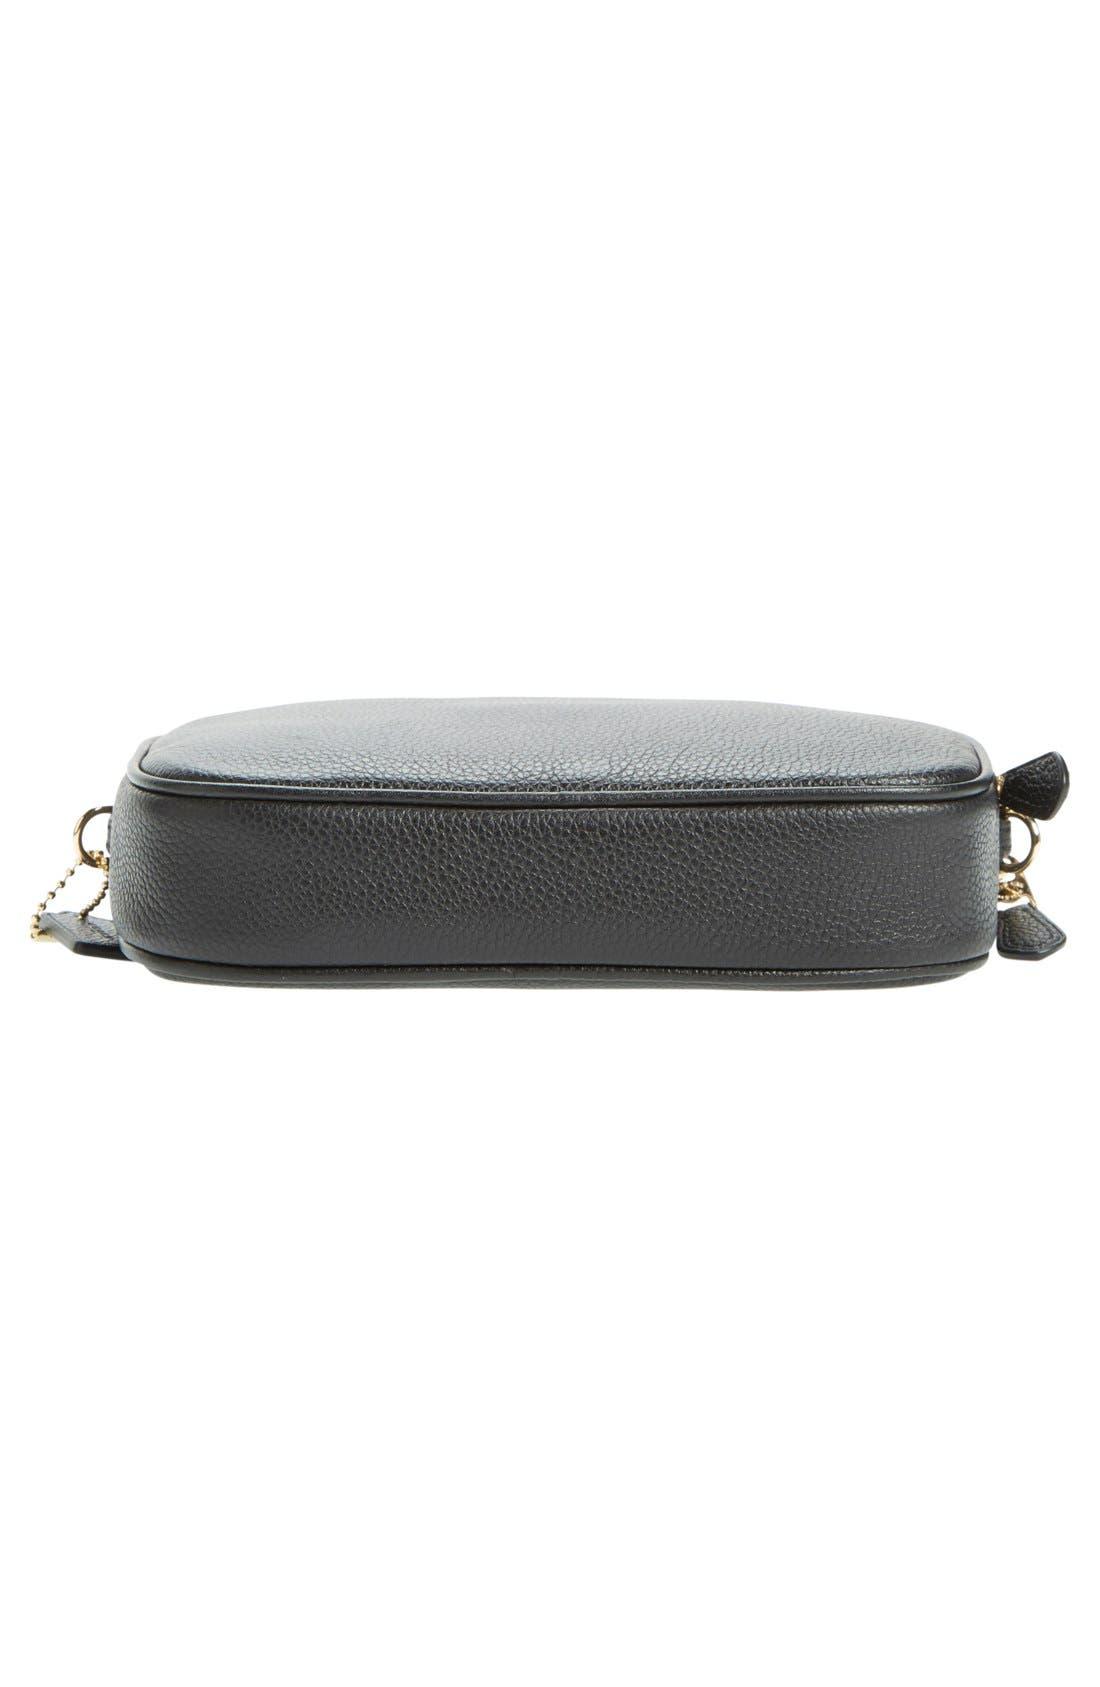 Convertible Leather Crossbody Bag,                             Alternate thumbnail 5, color,                             001